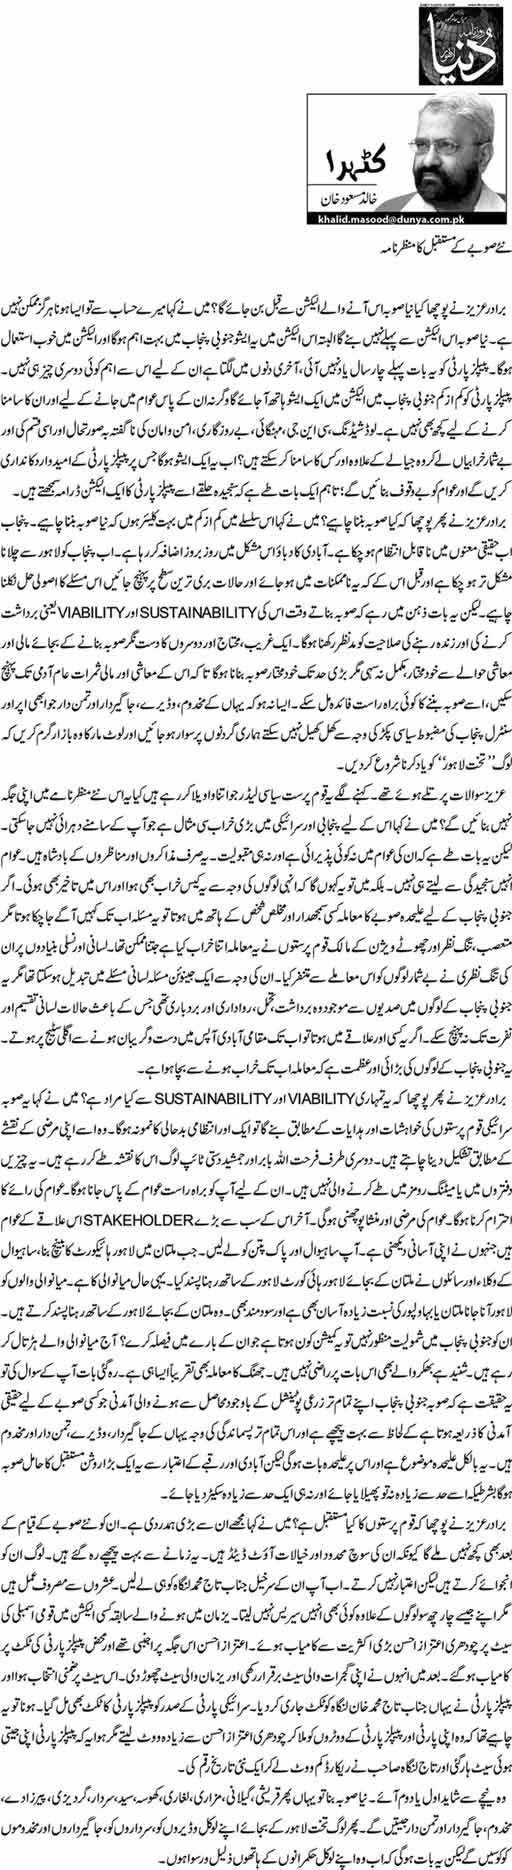 Nai Soobay k mustaqbil ka manzar e ama - Khalid Masood Khan